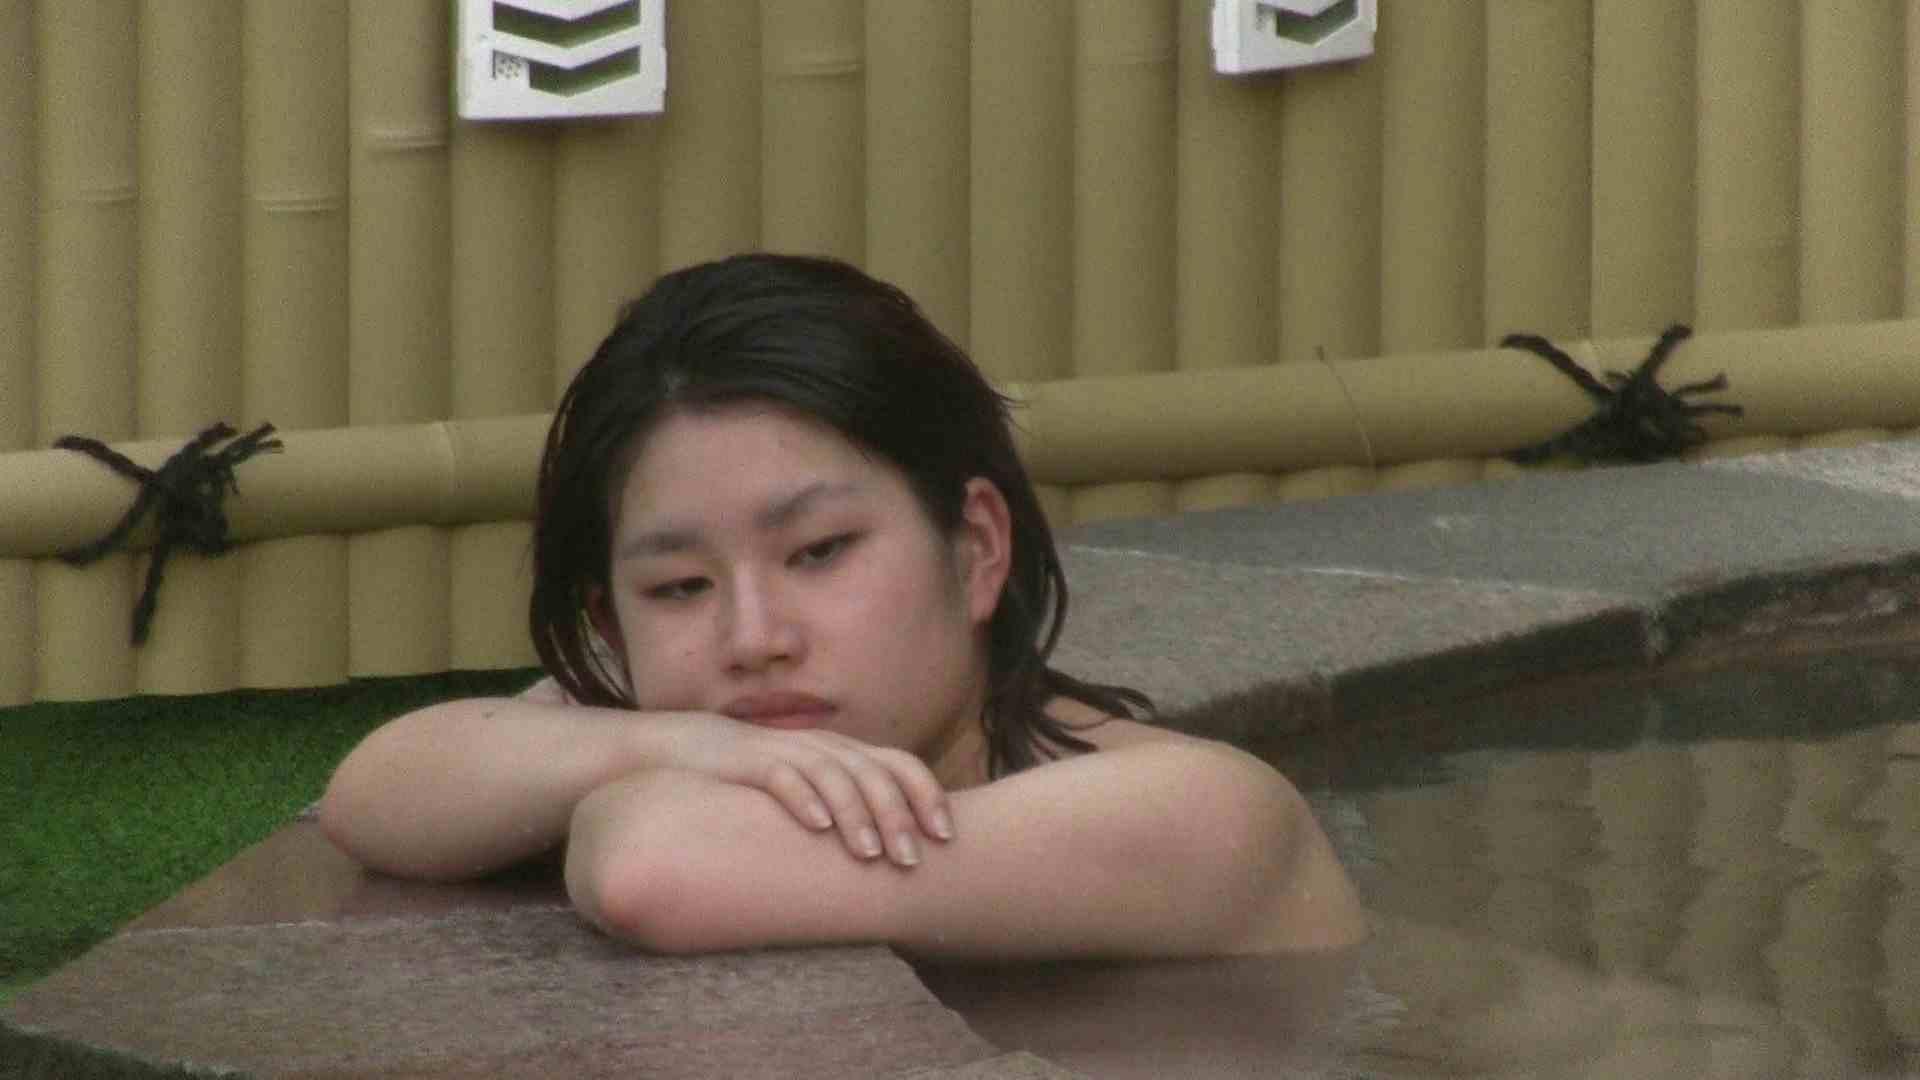 Aquaな露天風呂Vol.230 HなOL | 盗撮  83pic 30